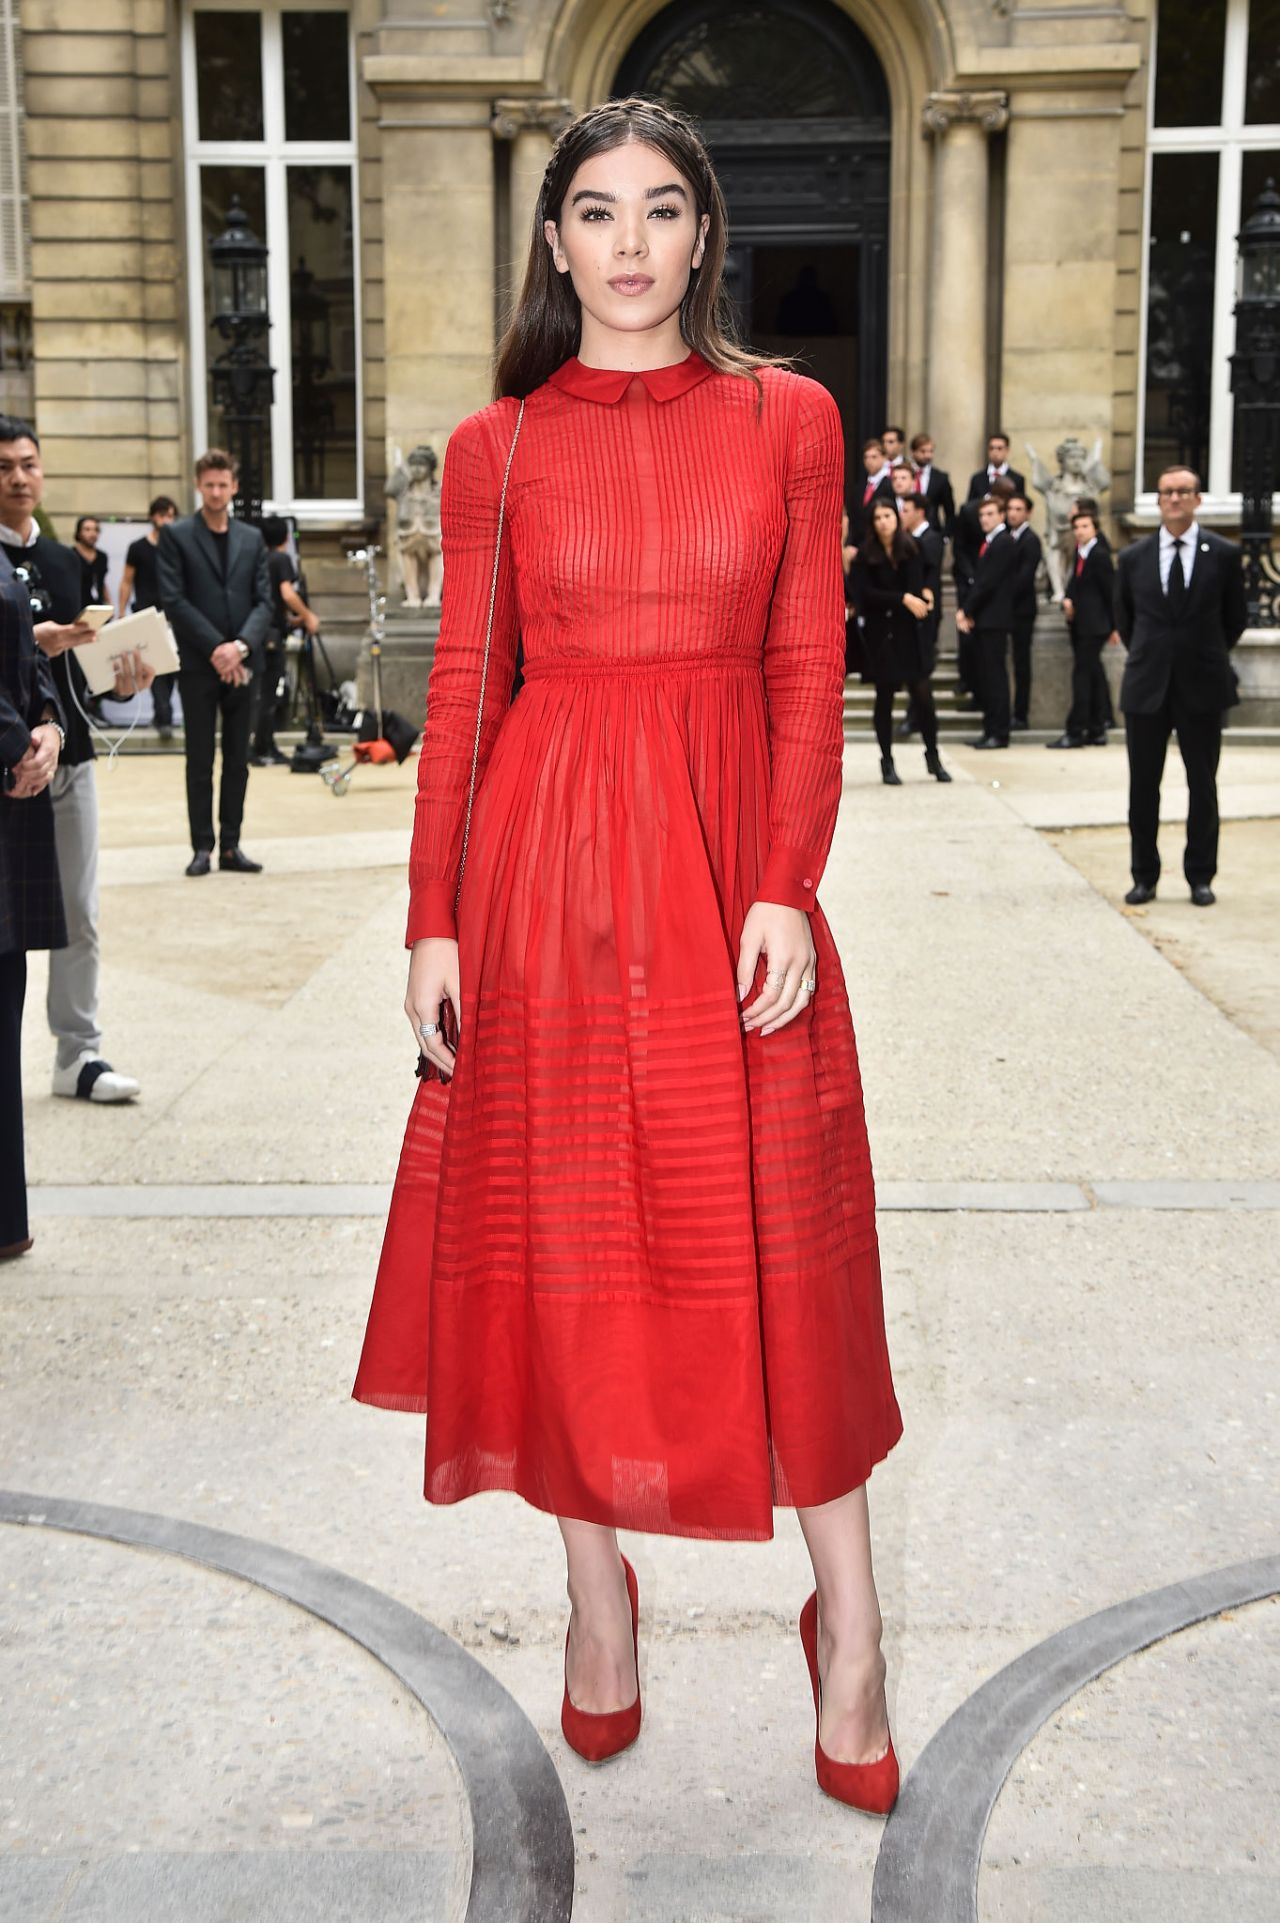 Hailee Steinfeld Valentino Show At Paris Fashion Week 10